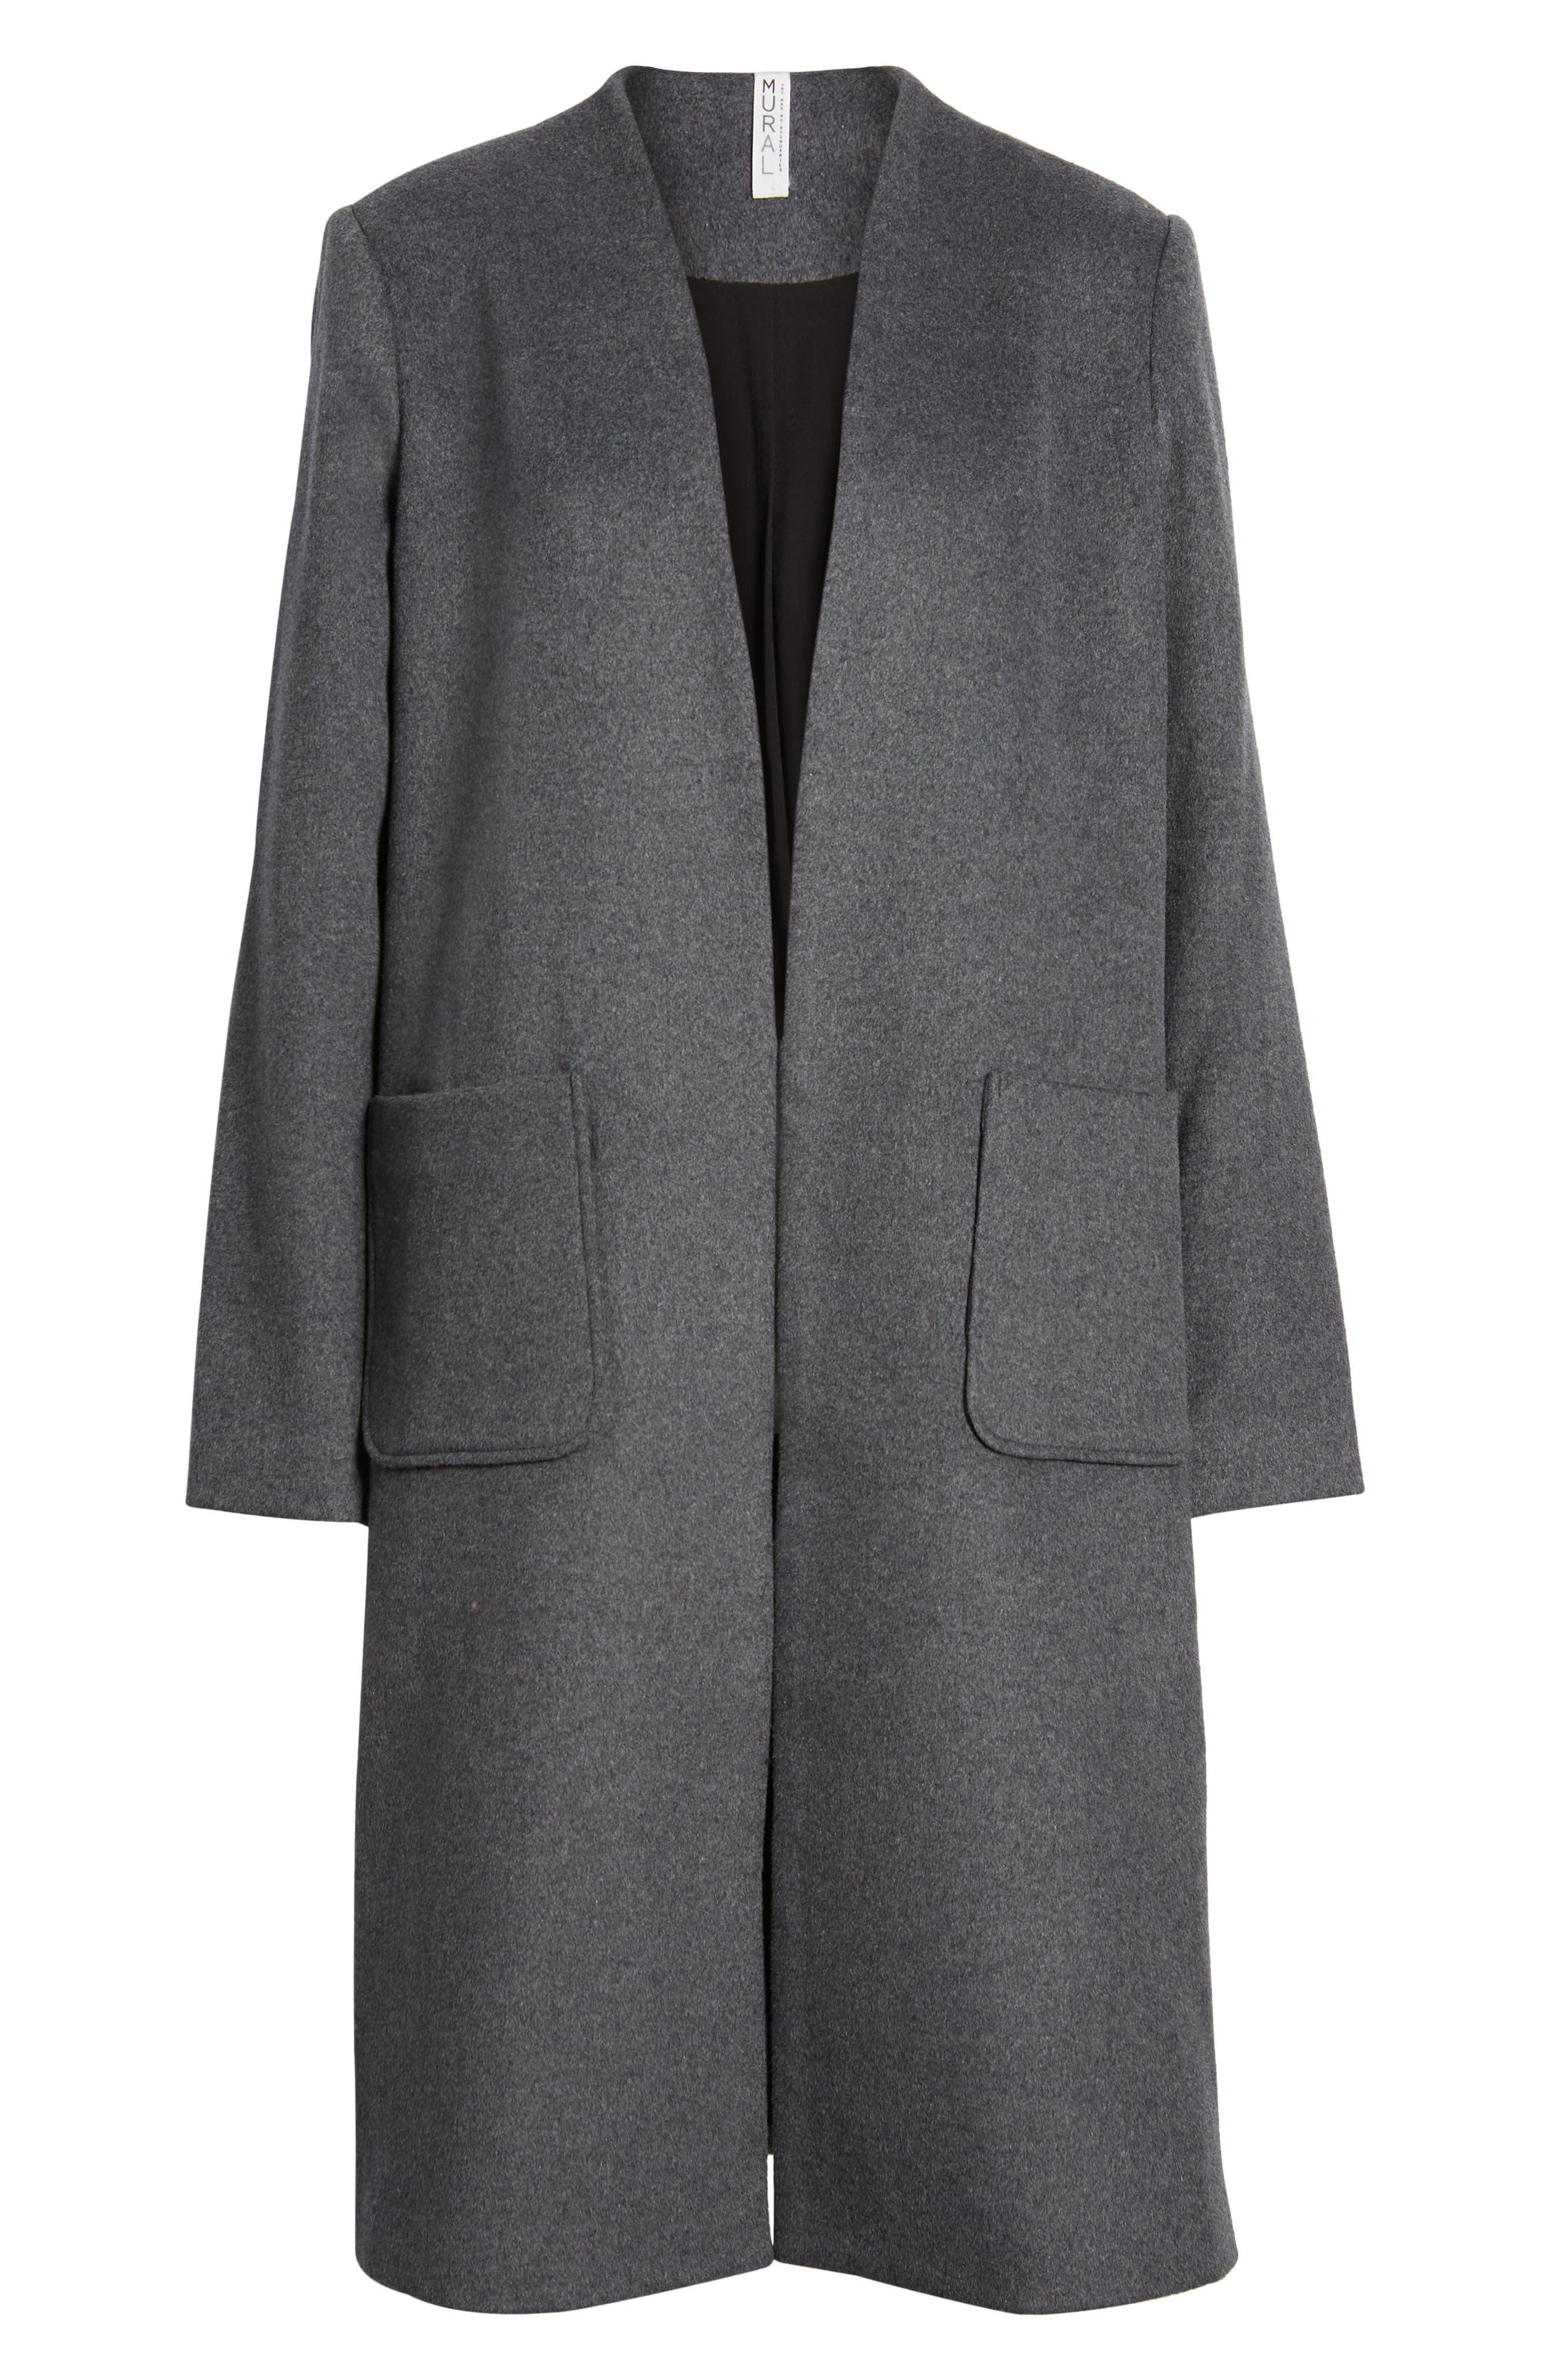 MURAL,                             Long Open Front Coat,                             Alternate thumbnail 6, color,                             CHARCOAL GREY